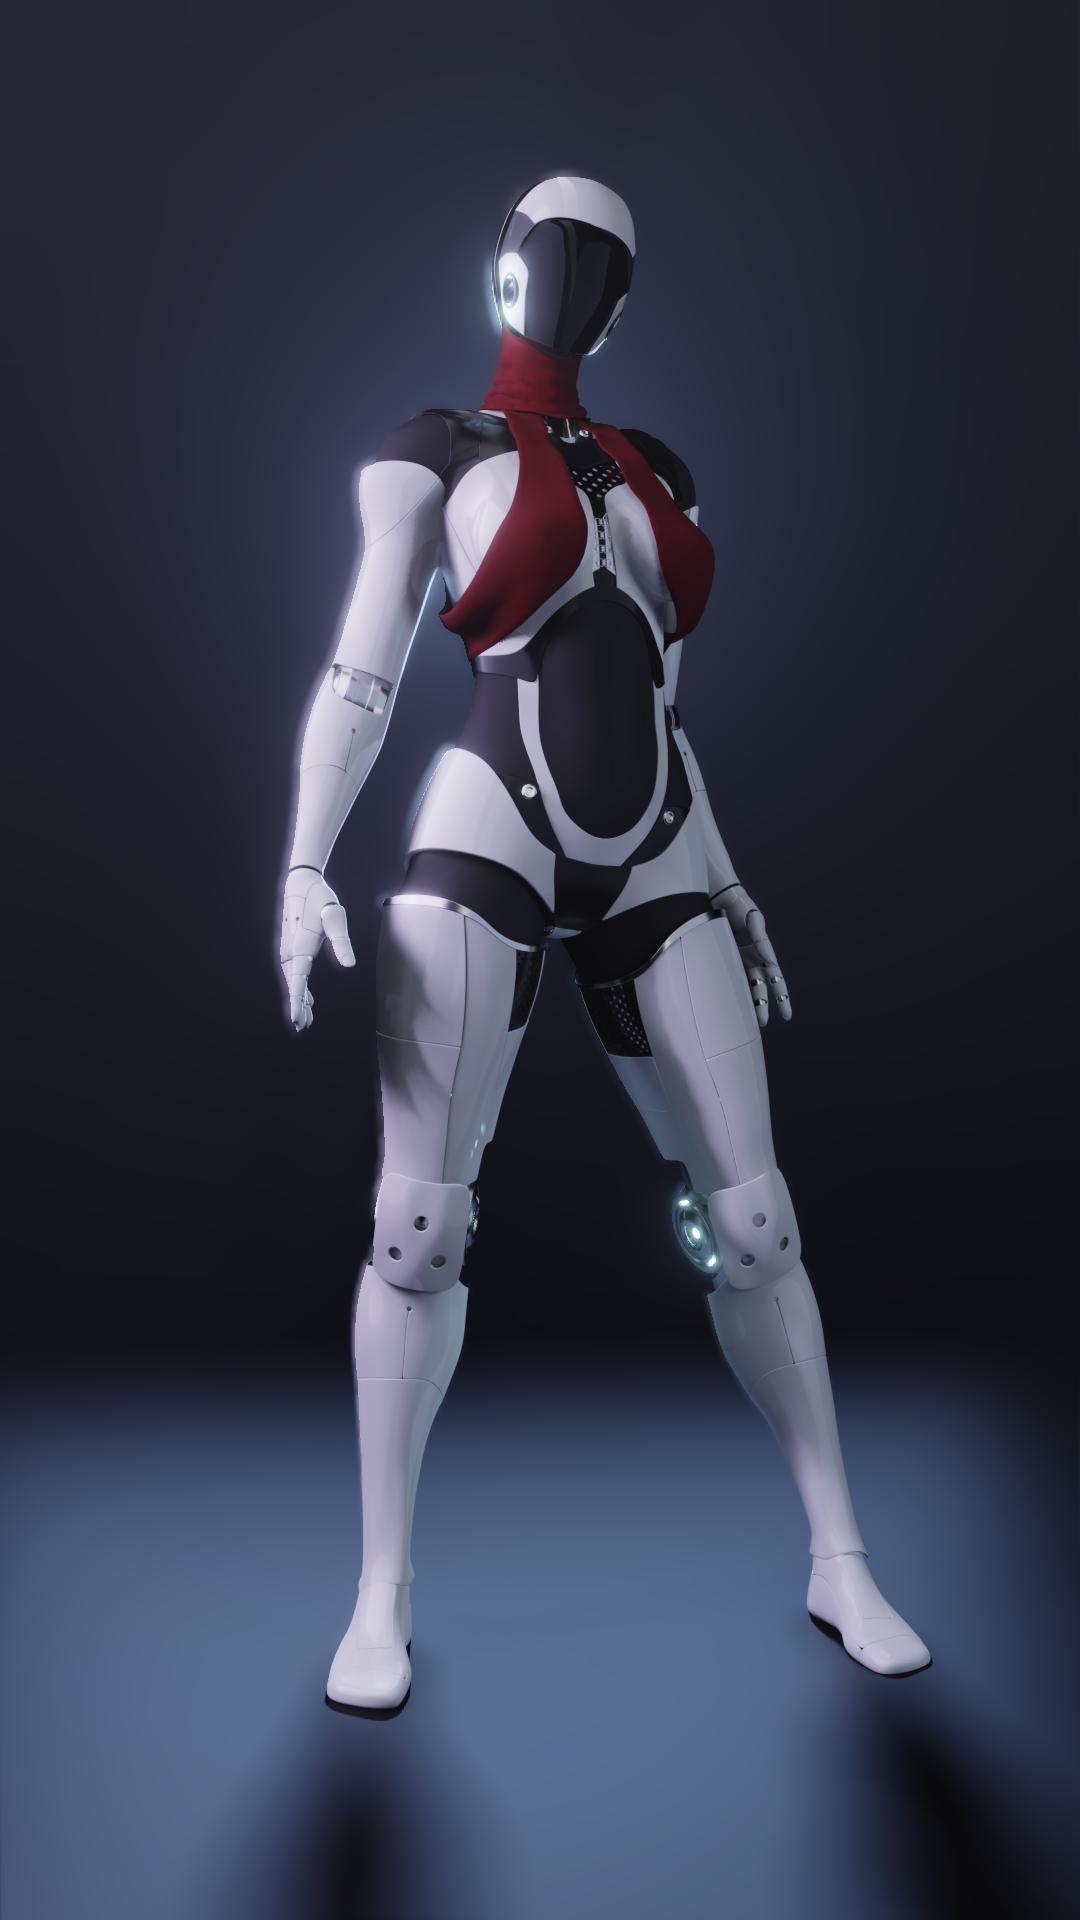 robot girl by aivarasd